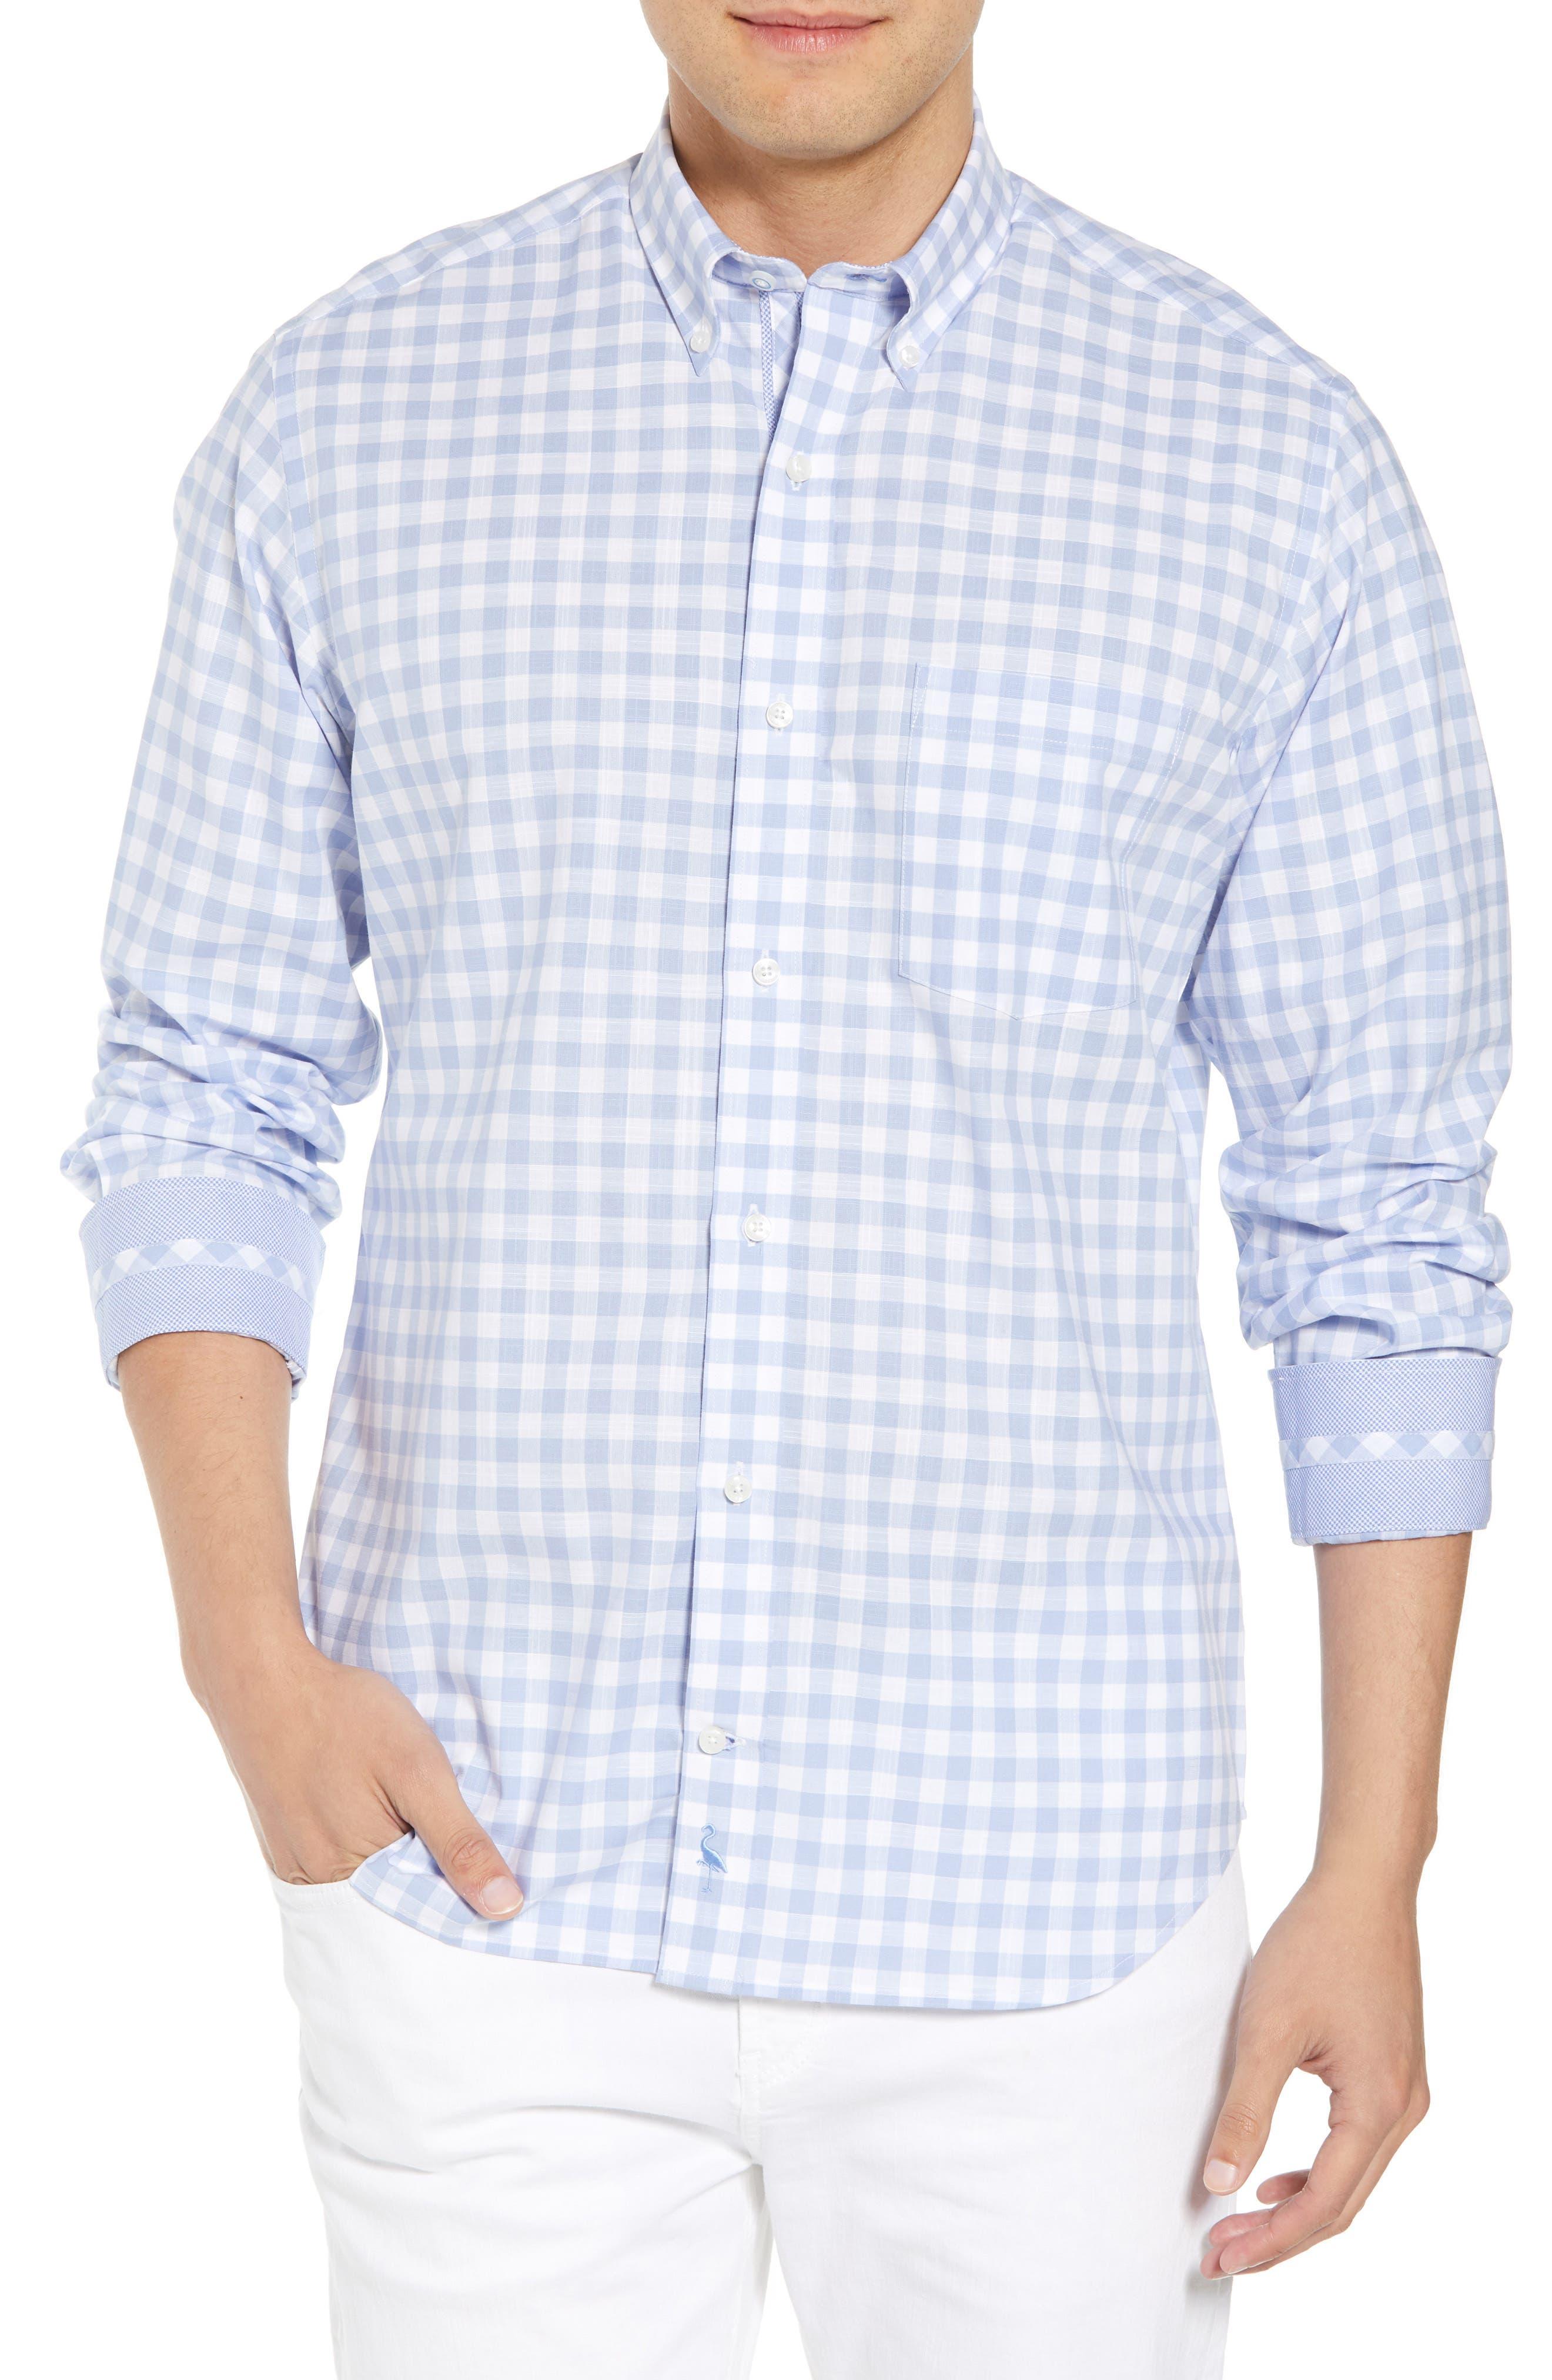 Eitenne Regular Fit Check Sport Shirt,                             Main thumbnail 1, color,                             Light Blue